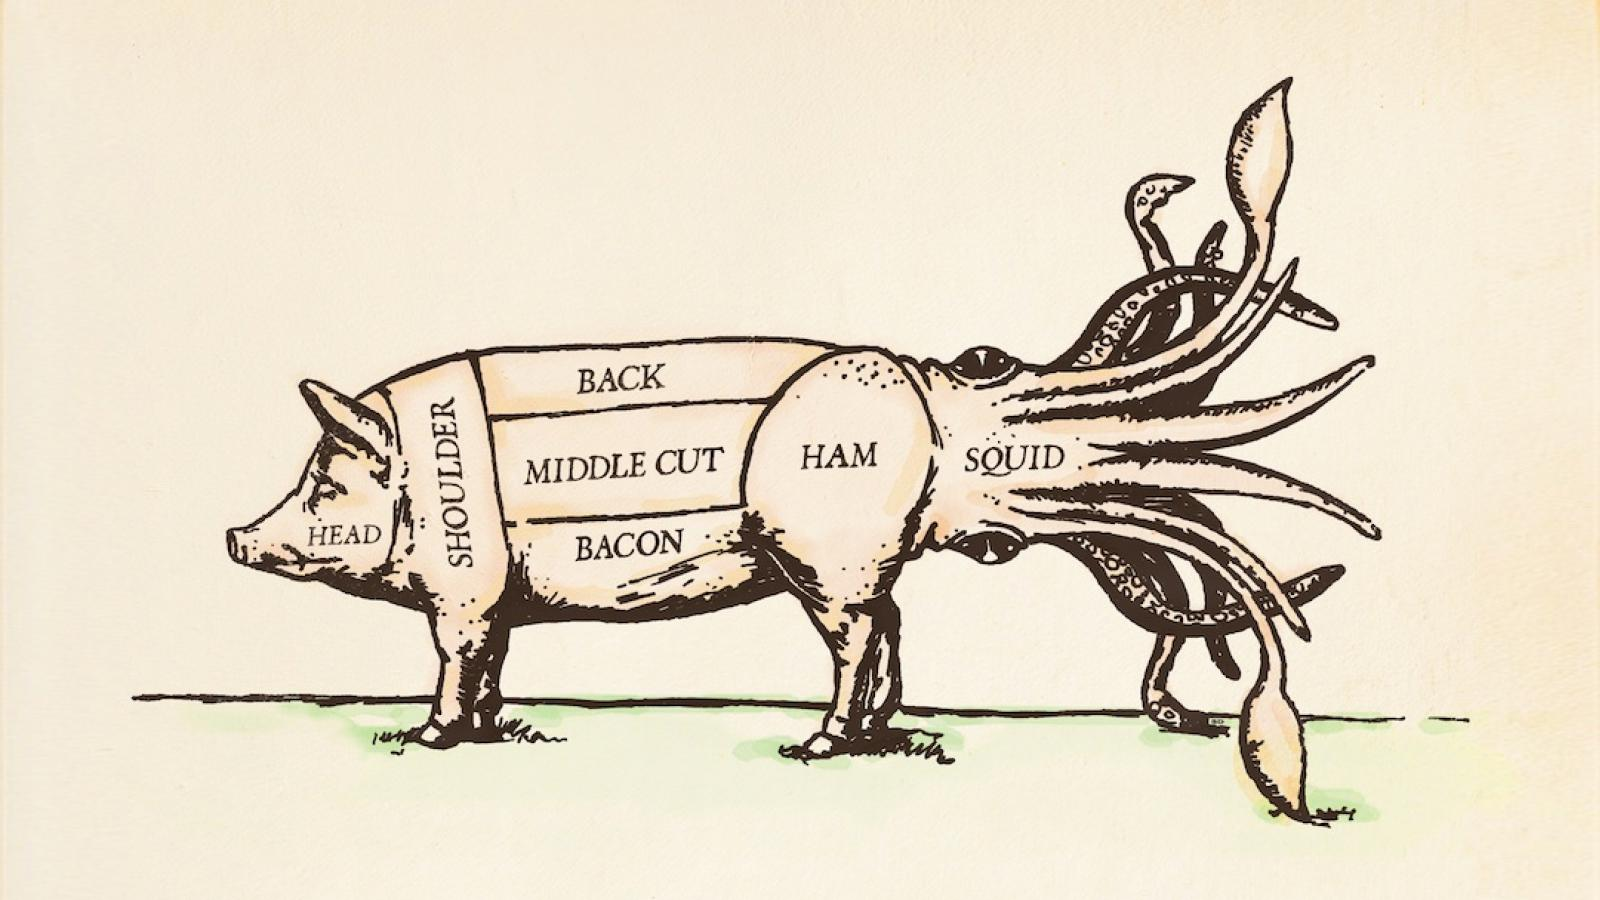 doppelg ngers this american lifeyork pig diagram 19 [ 1600 x 900 Pixel ]